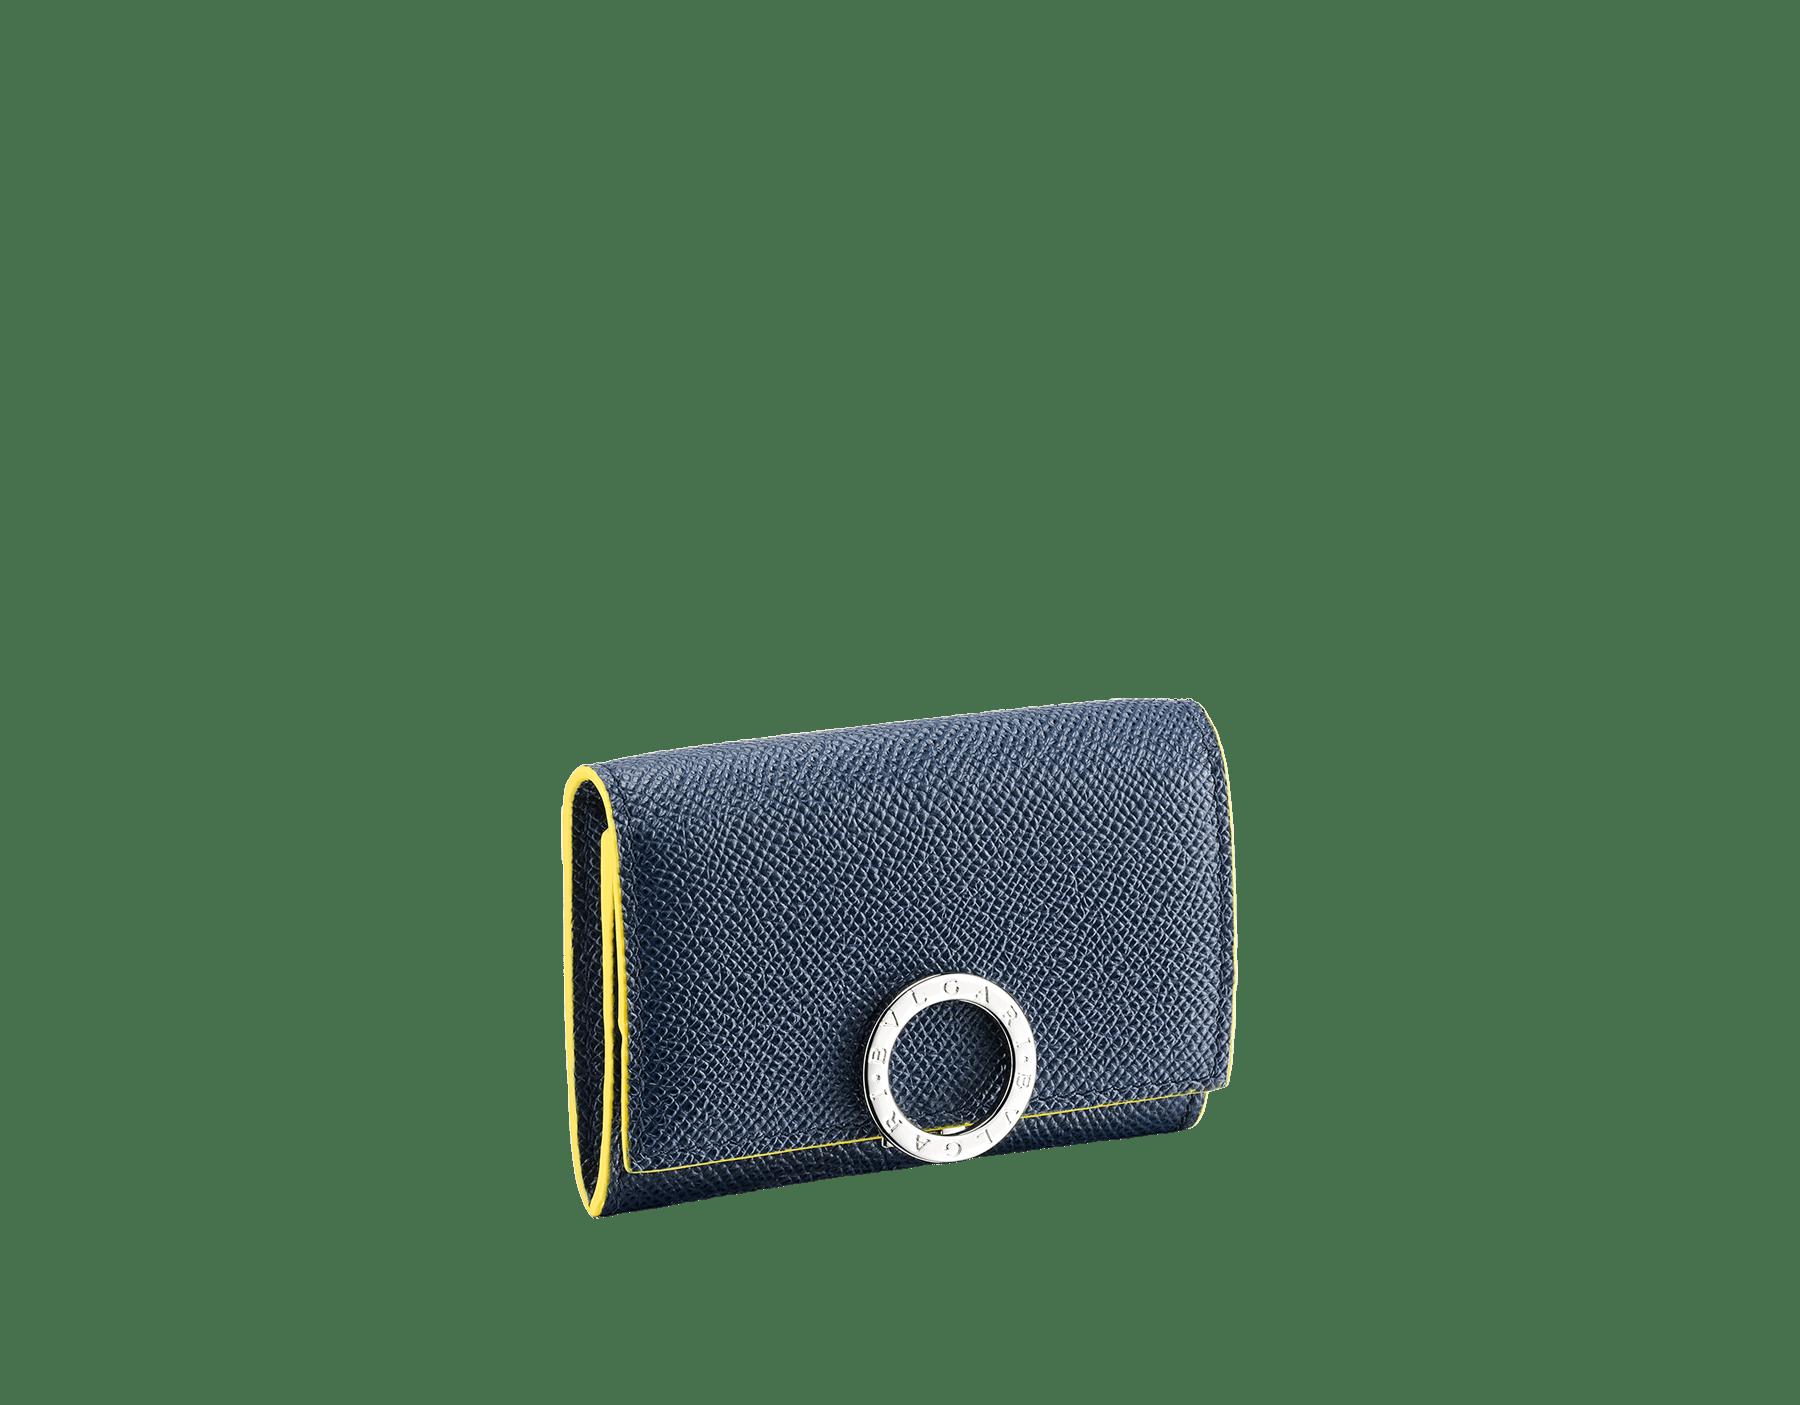 BVLGARI BVLGARI 零錢包,採用綠玉色和火珀色珠面小牛皮。經典鍍釕黃銅品牌標誌扣環。 BCM-WLT-S-RECTb image 1